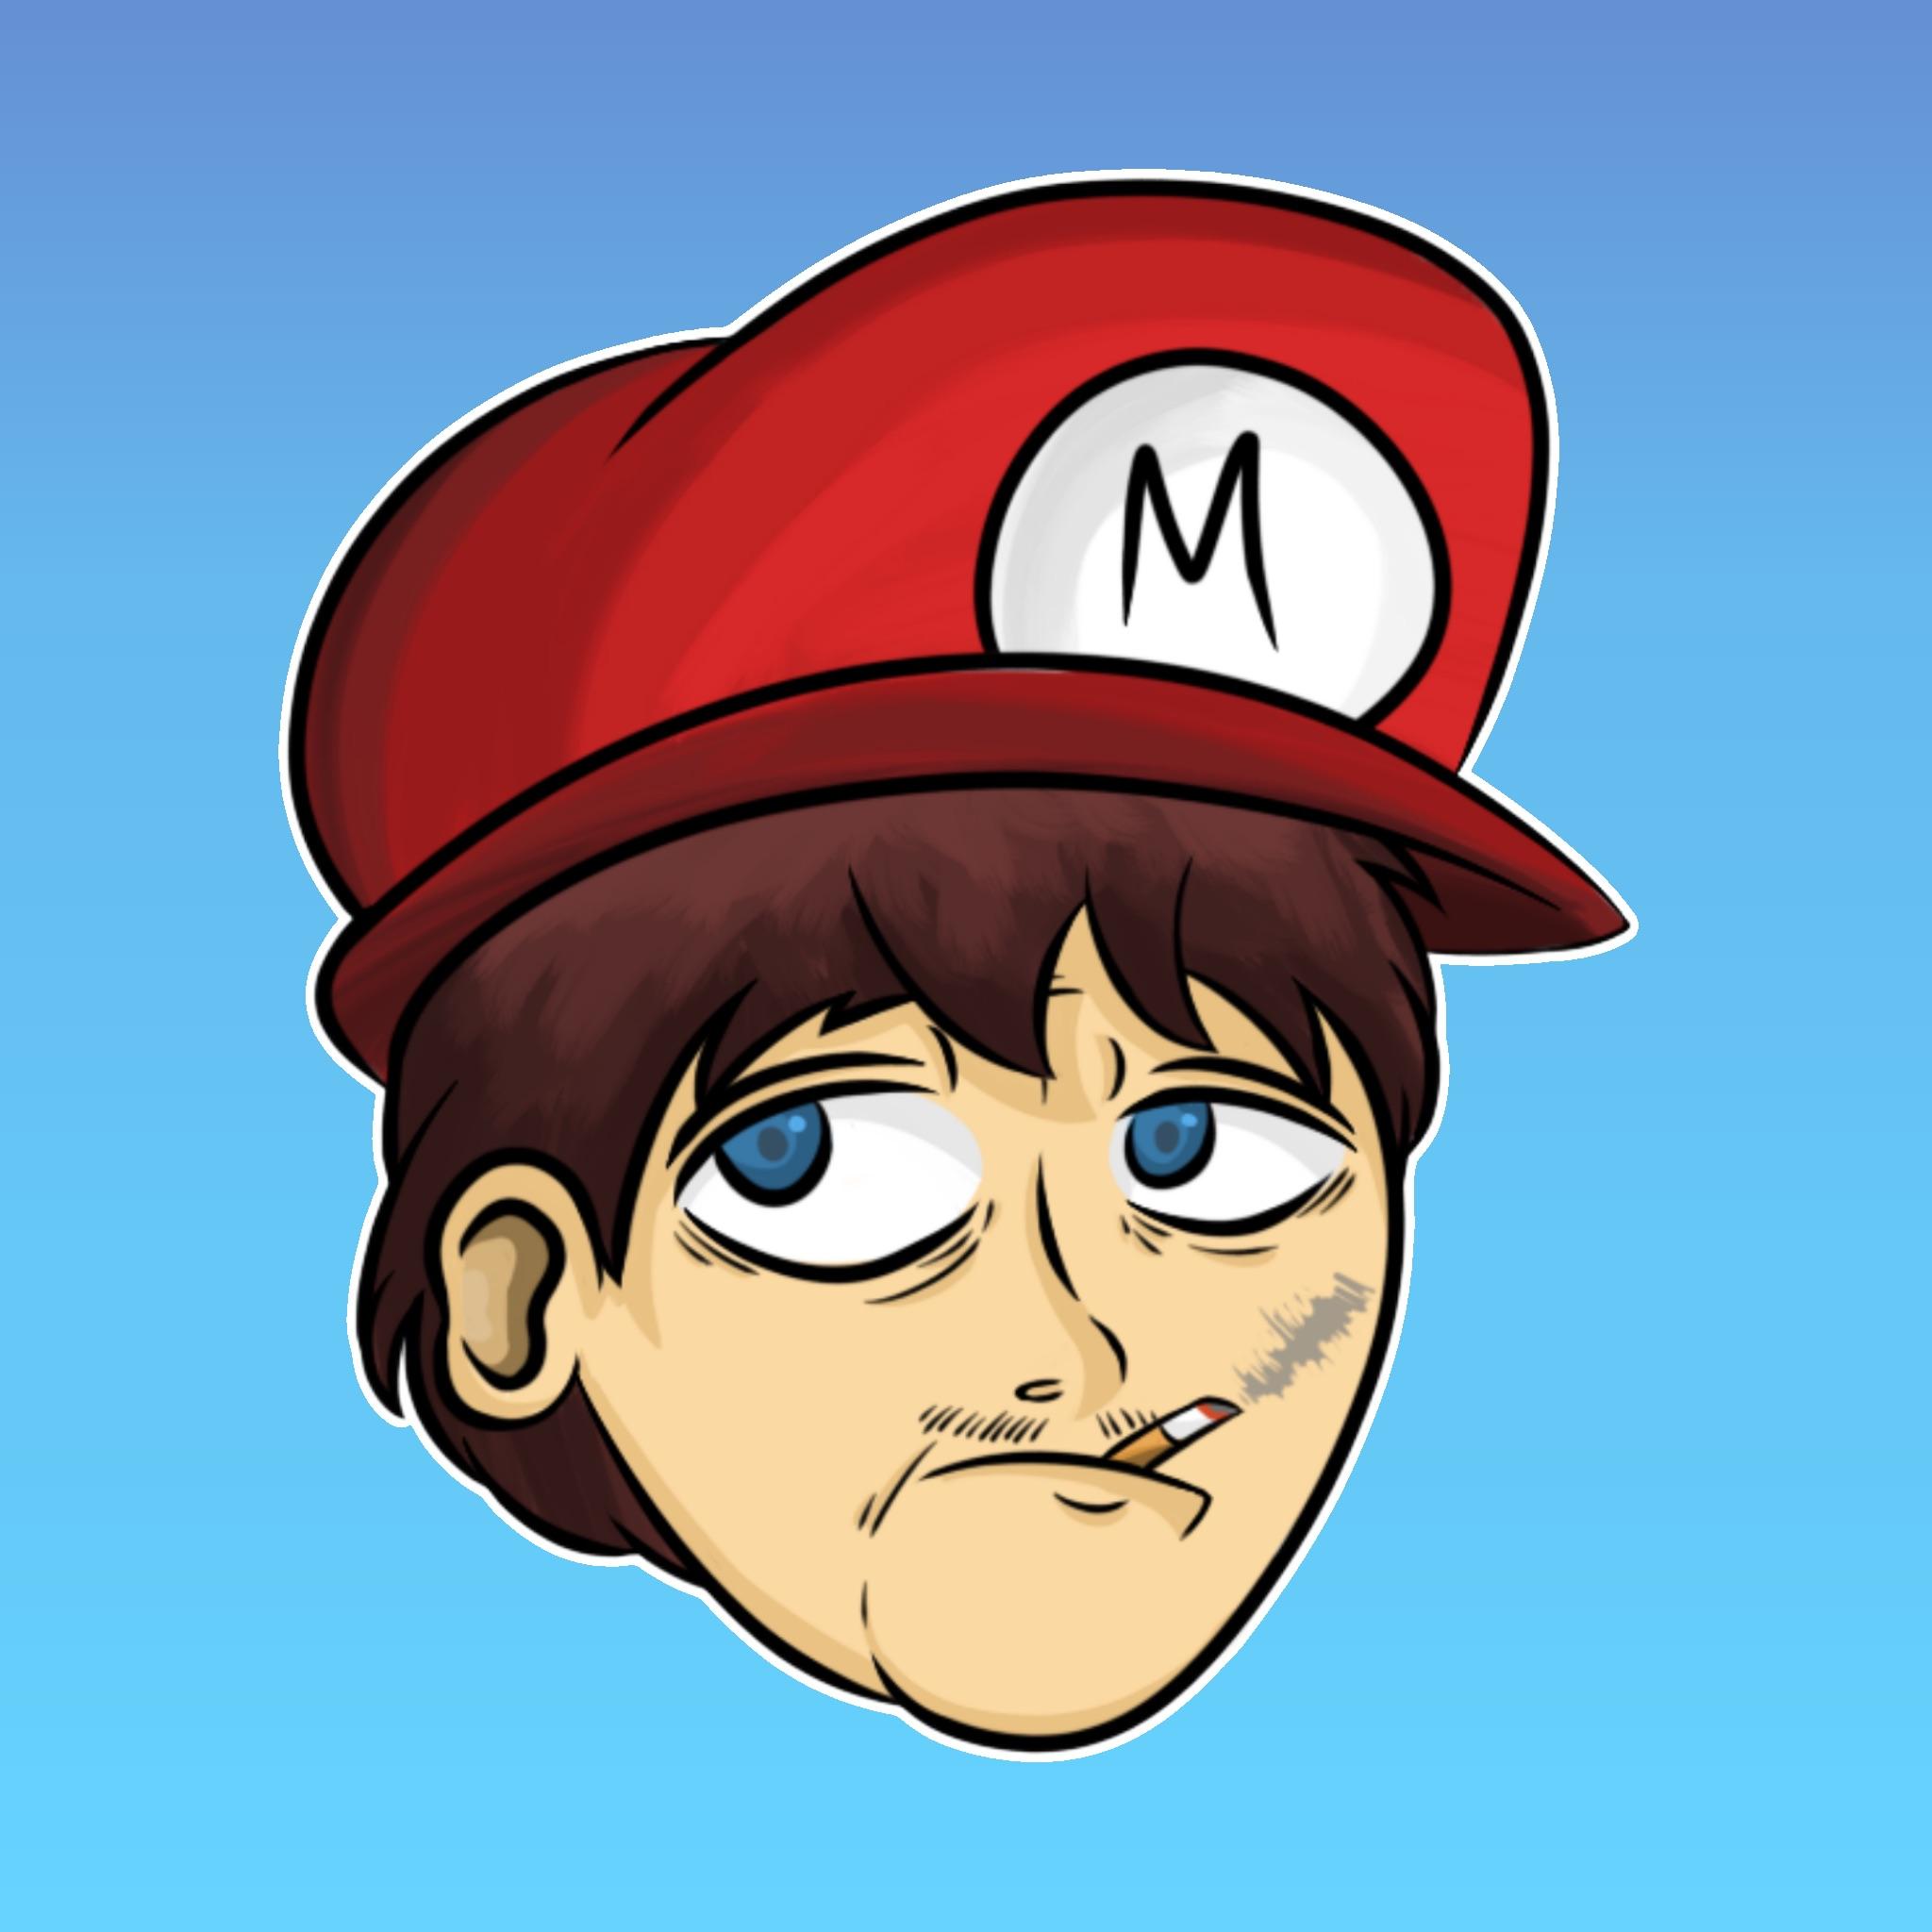 Thug Mario [Drawing] - 2/14/16